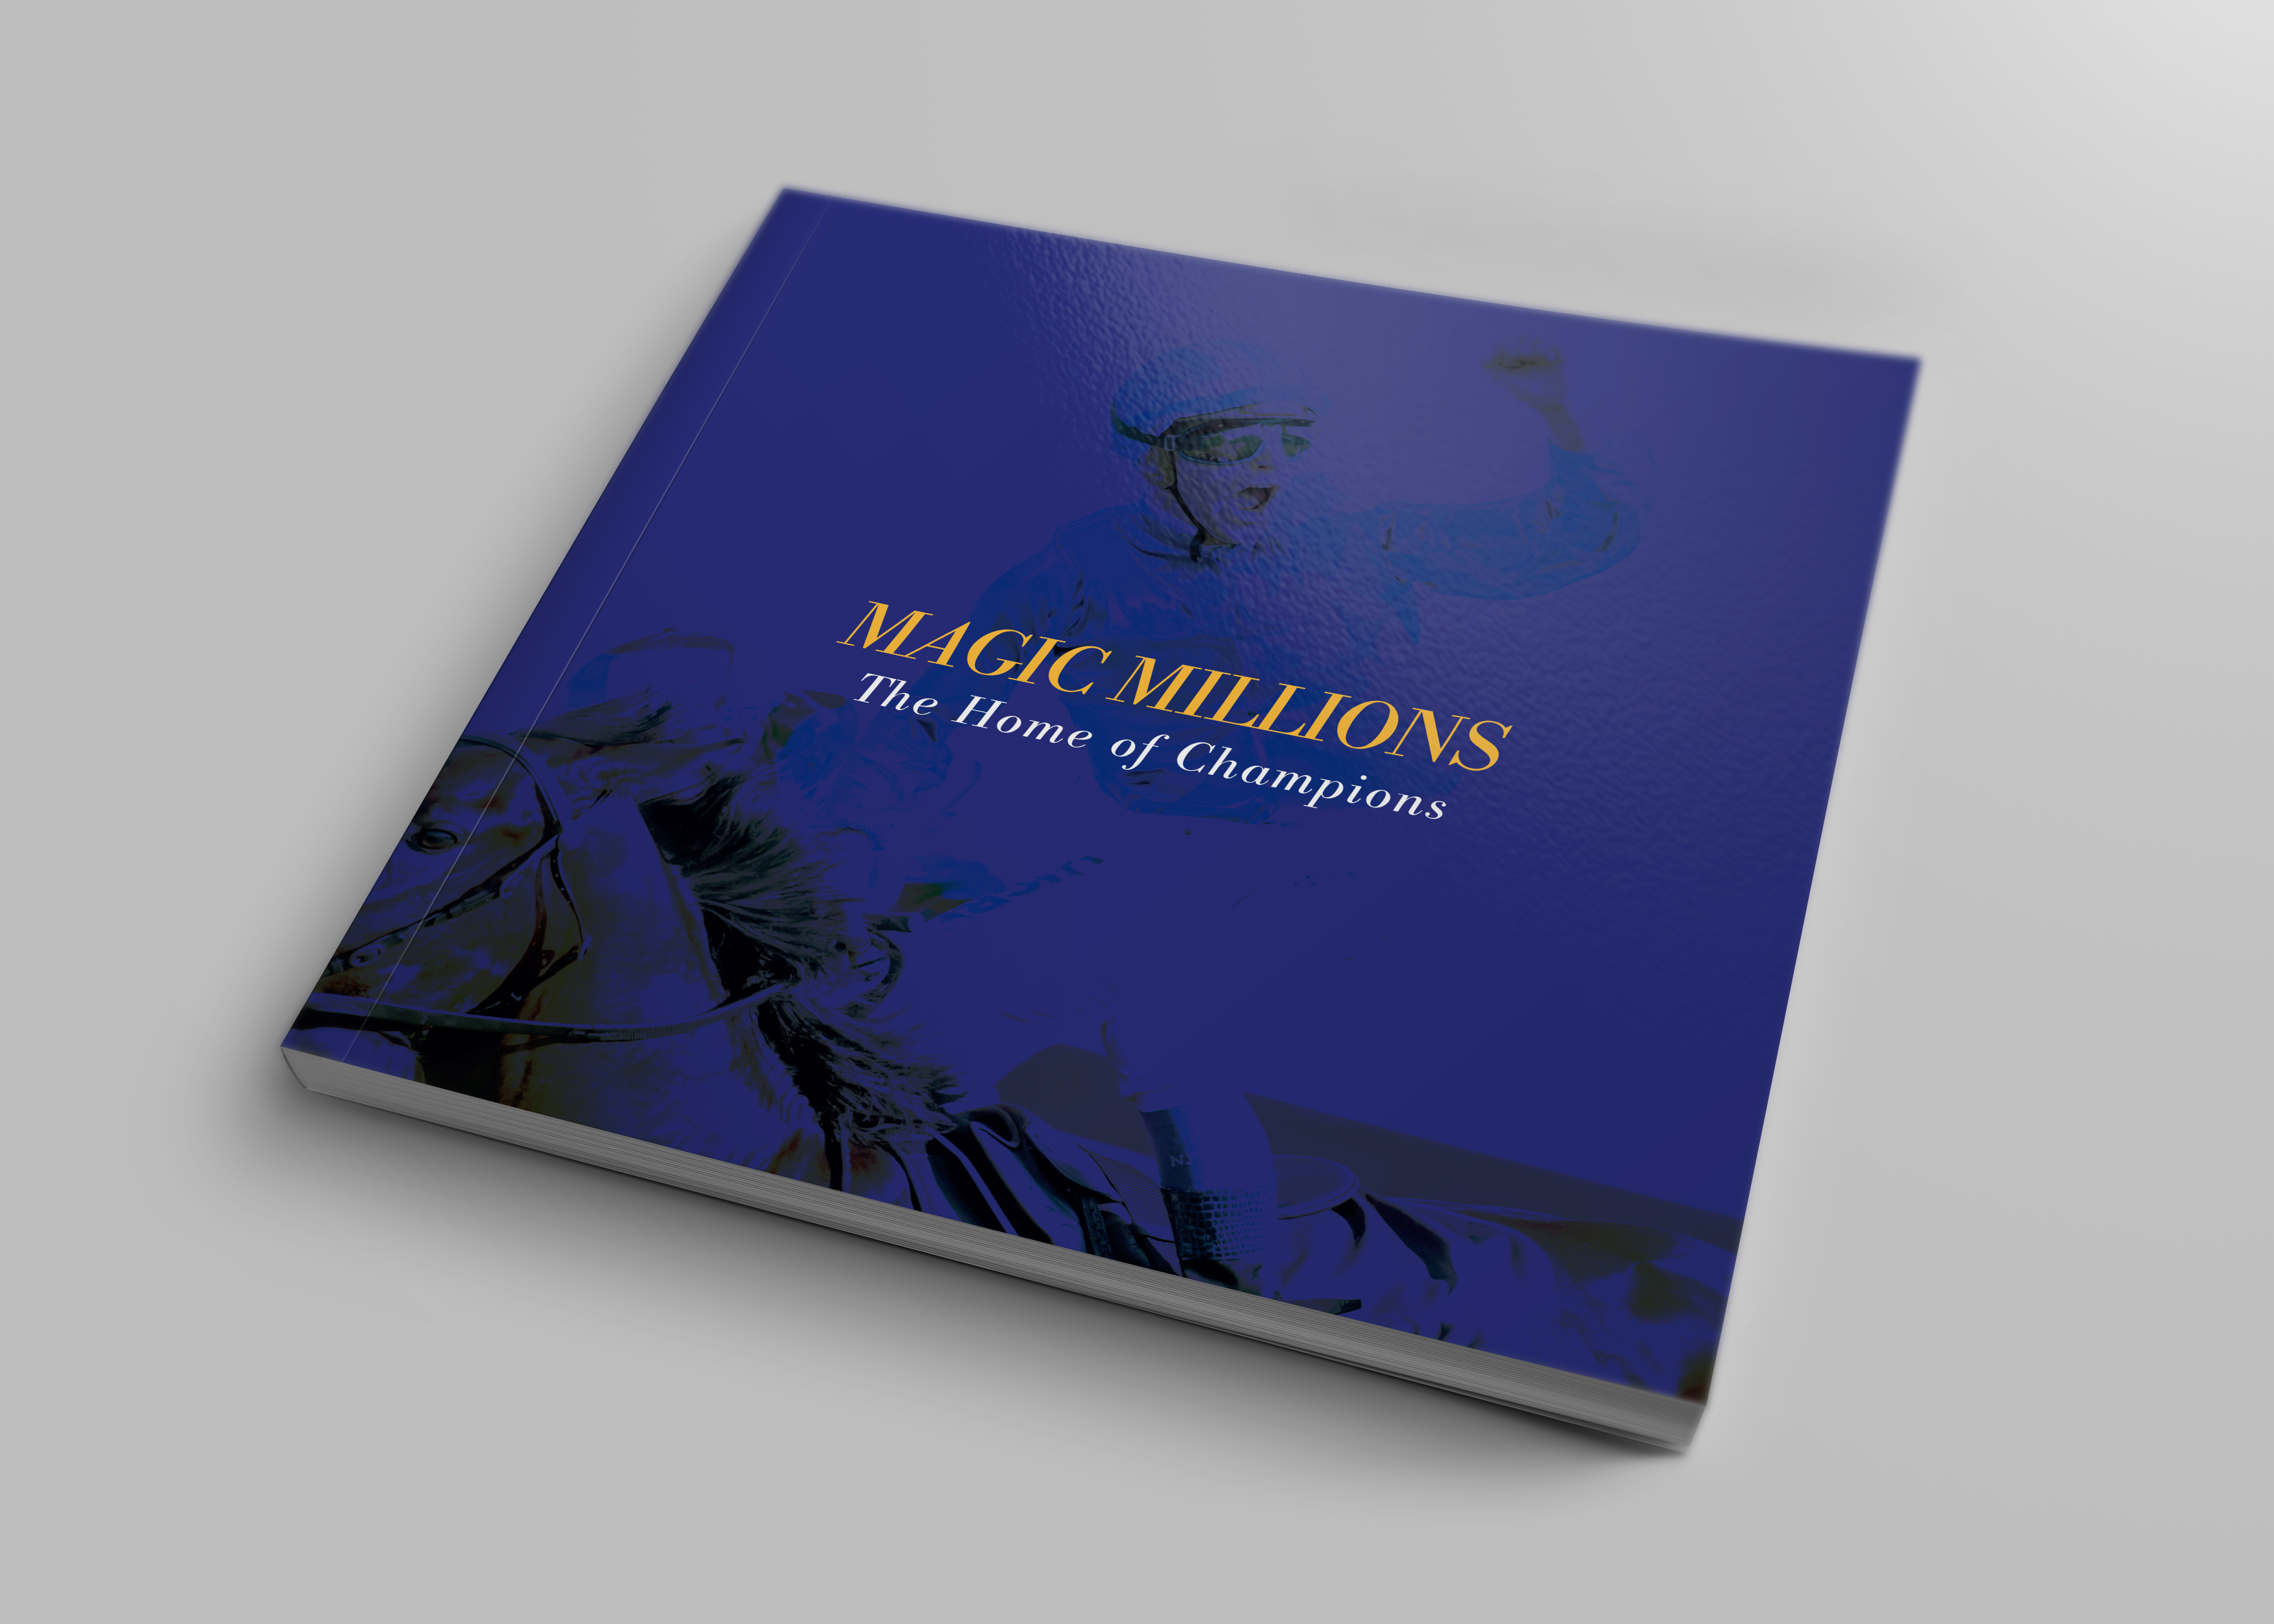 Magic Millions